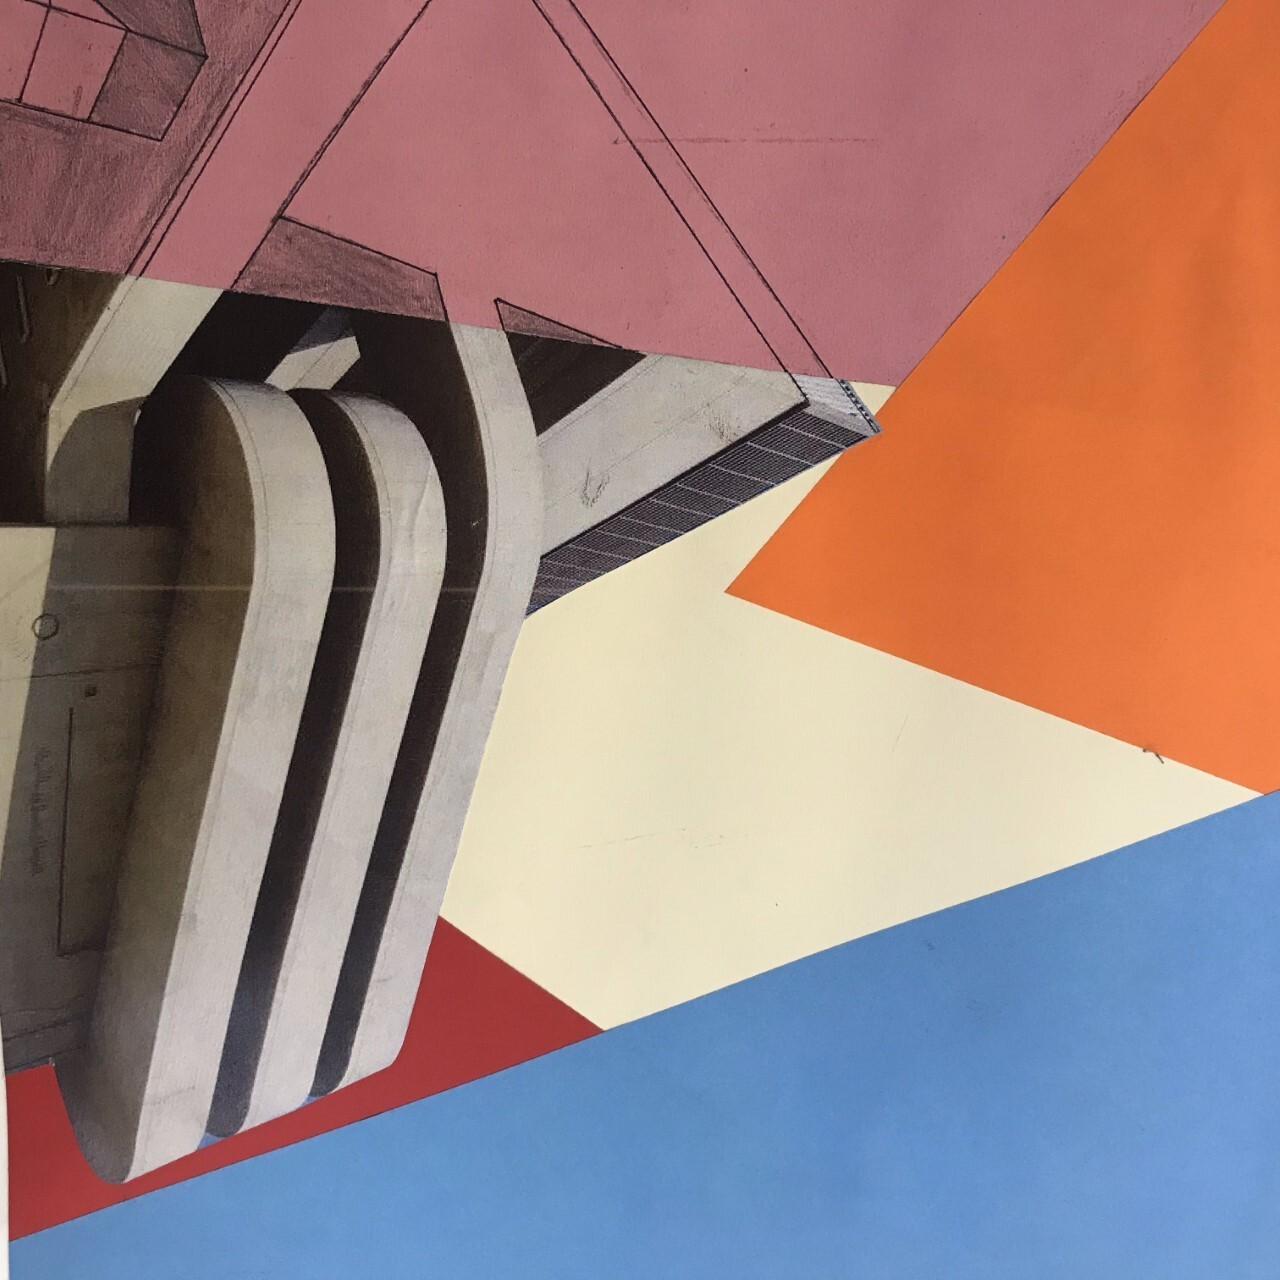 JC Y11 mixed media, collage building